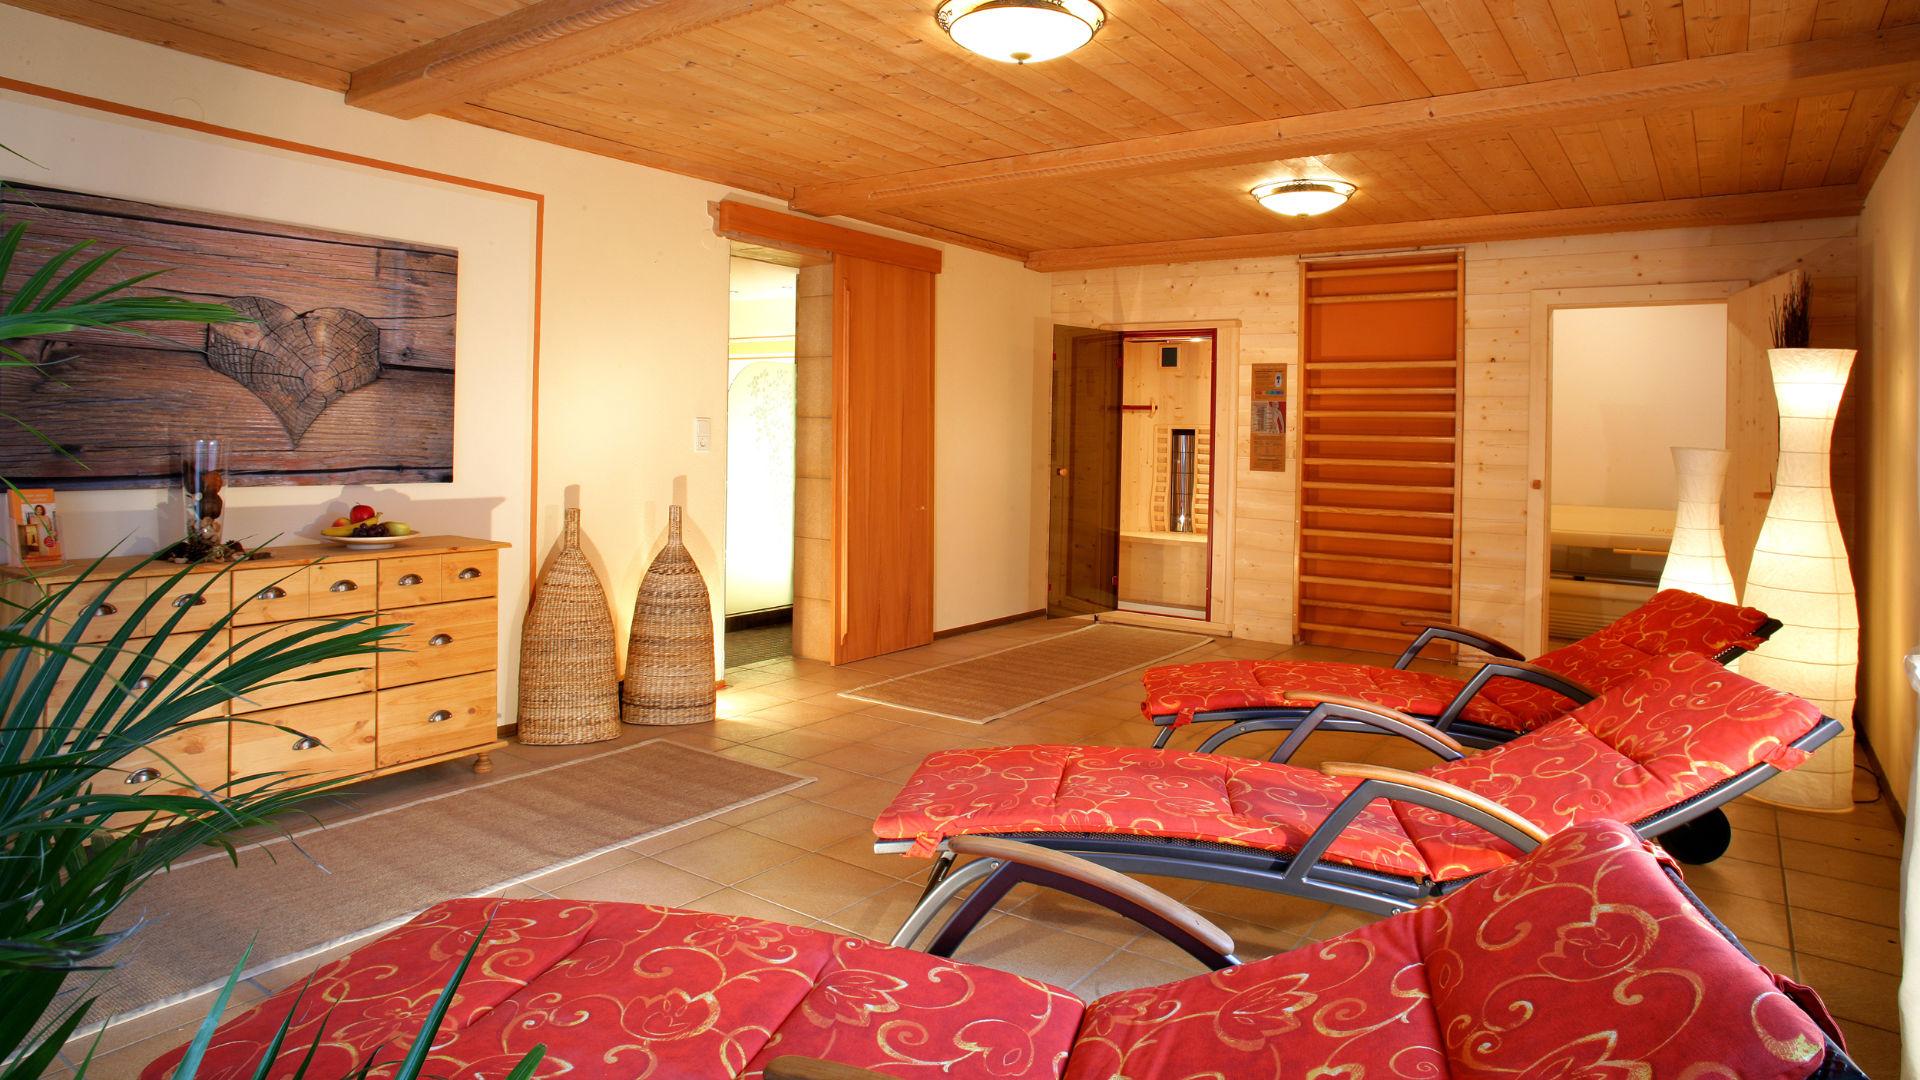 ledererhof-gasthof-pension-ebbs-zimmer-hotel-tirol-sauna-wellness